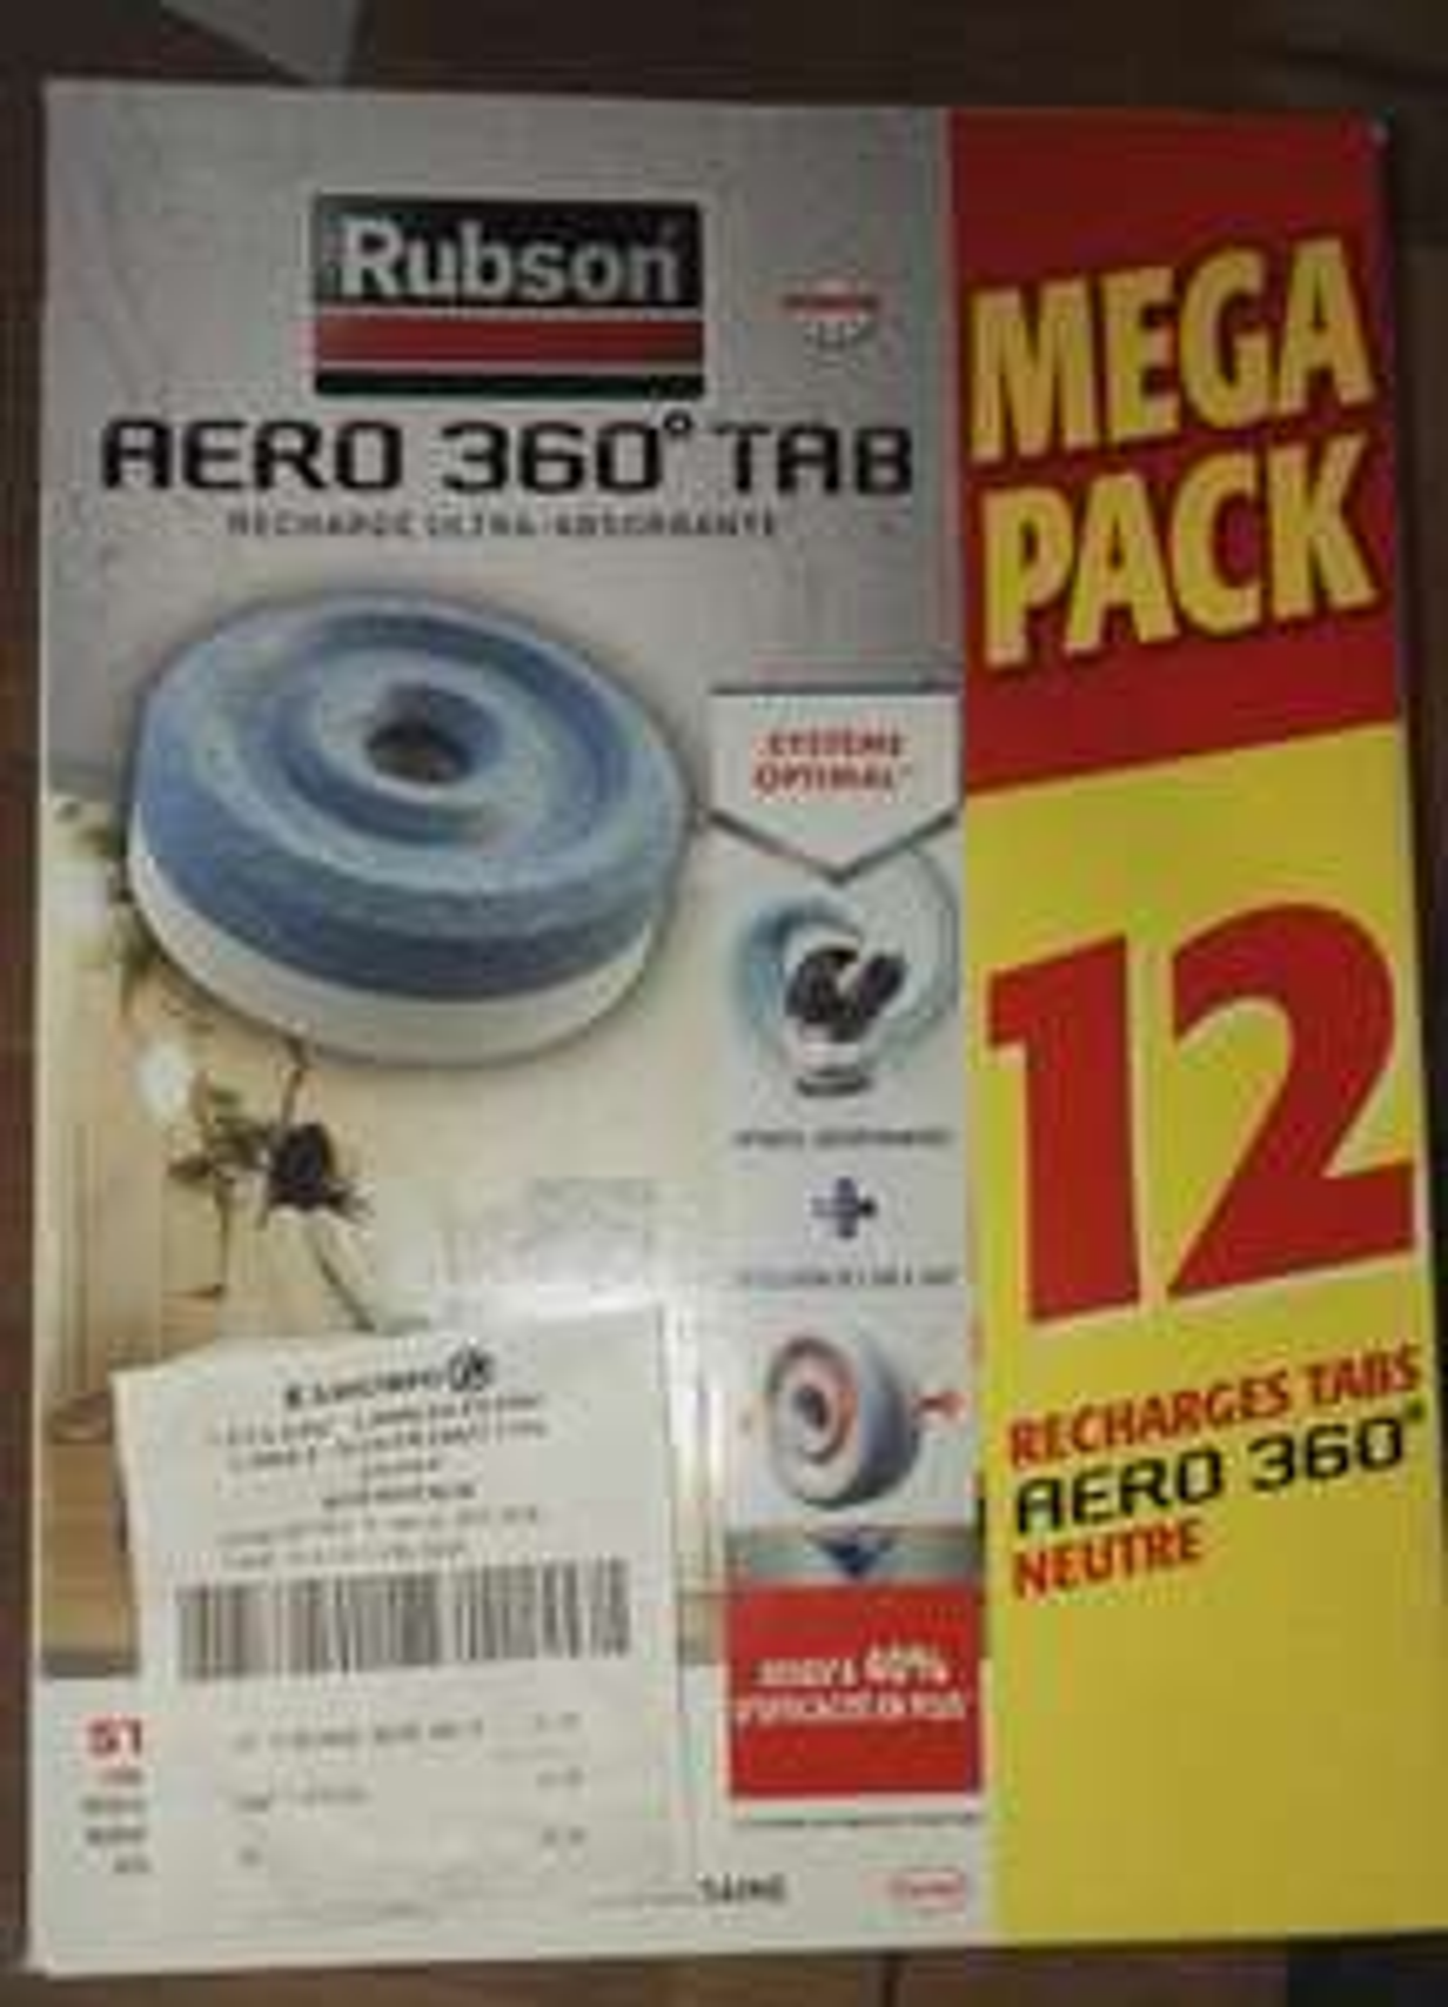 Mega Pack 12 recharges Rubson Aero 360° Tab - Landivisiau (29)